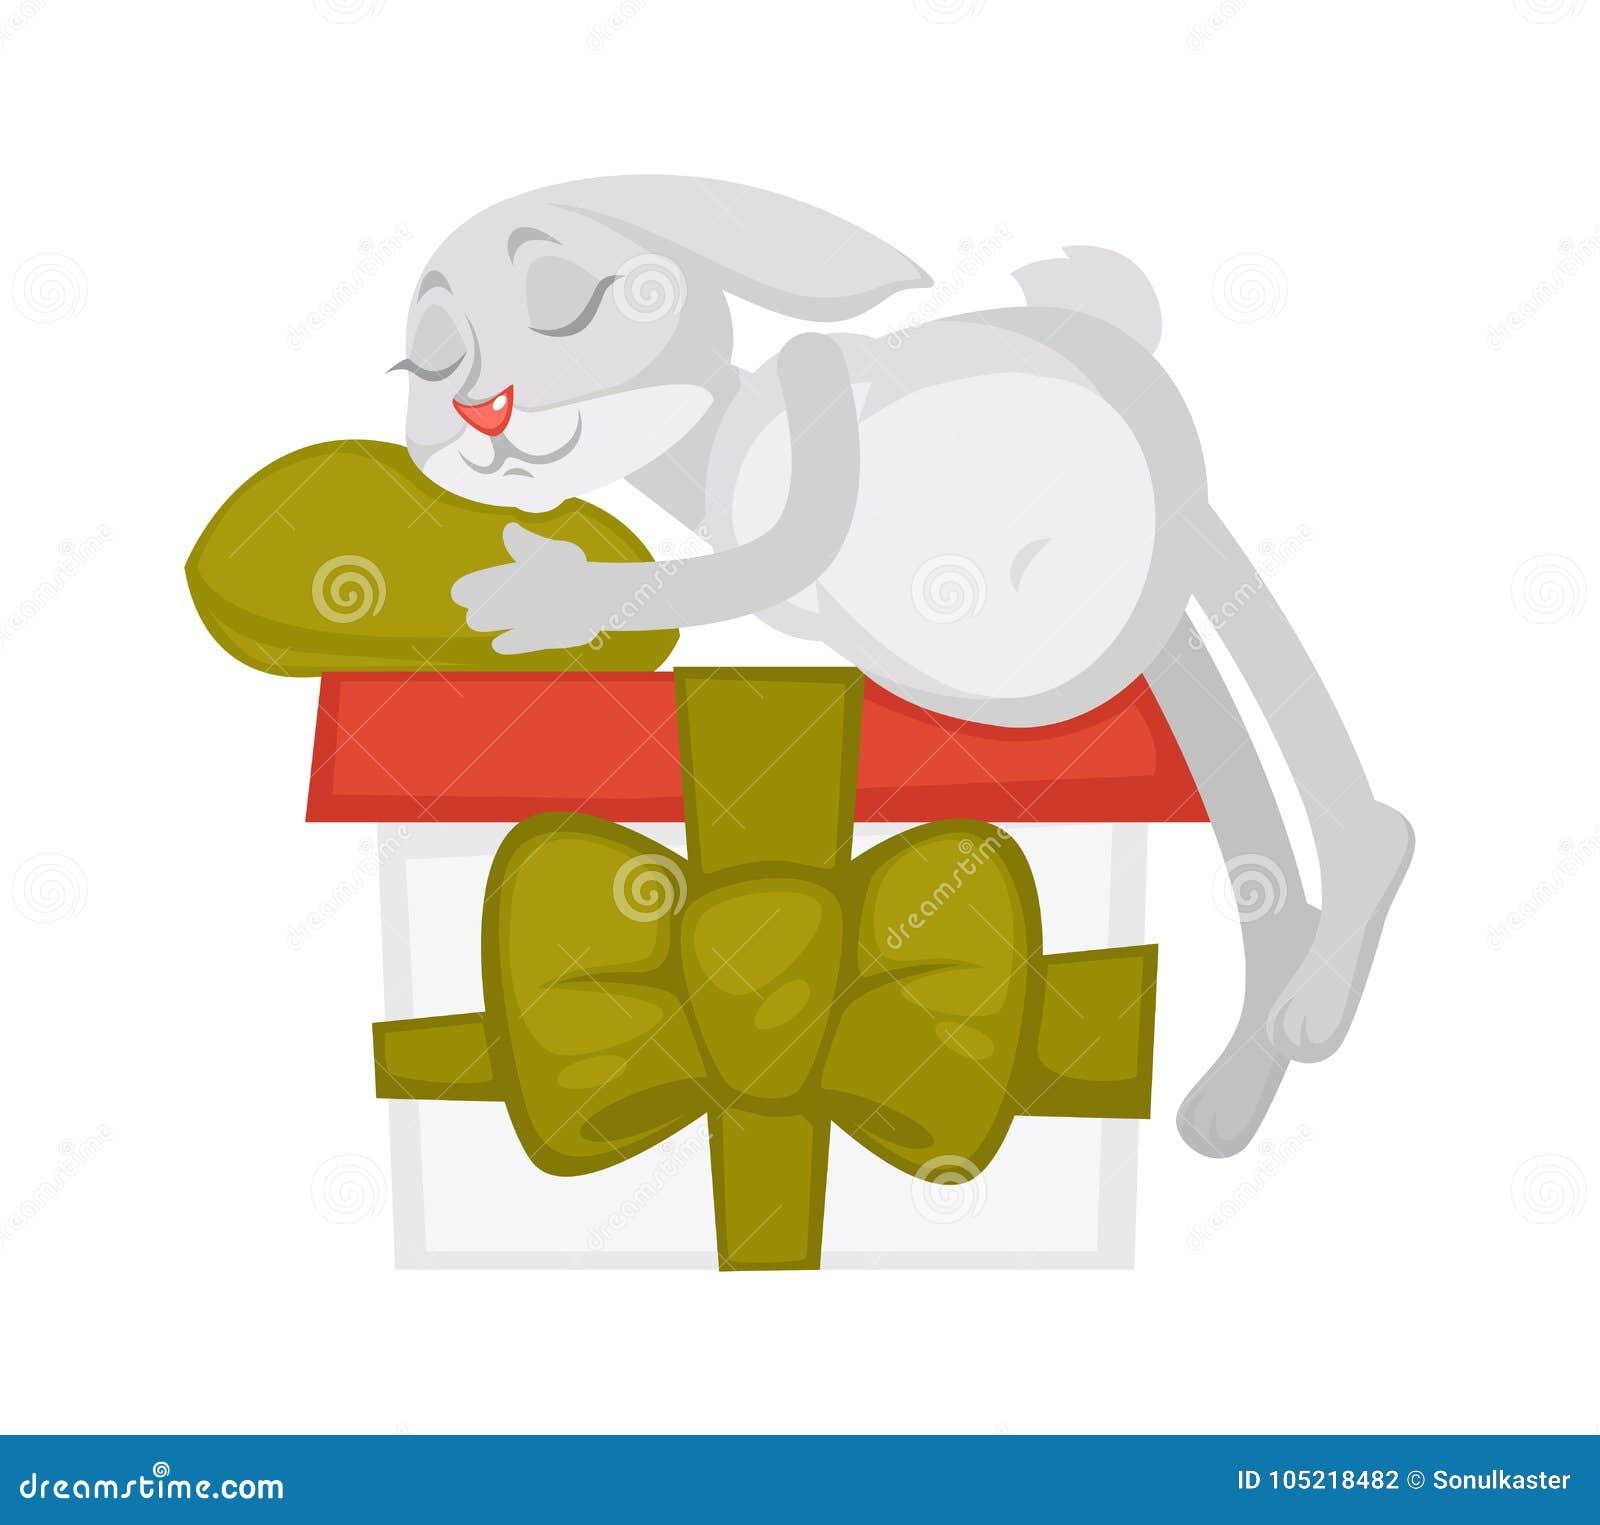 Bunny sleeps on huge gift box with ribbon and bow